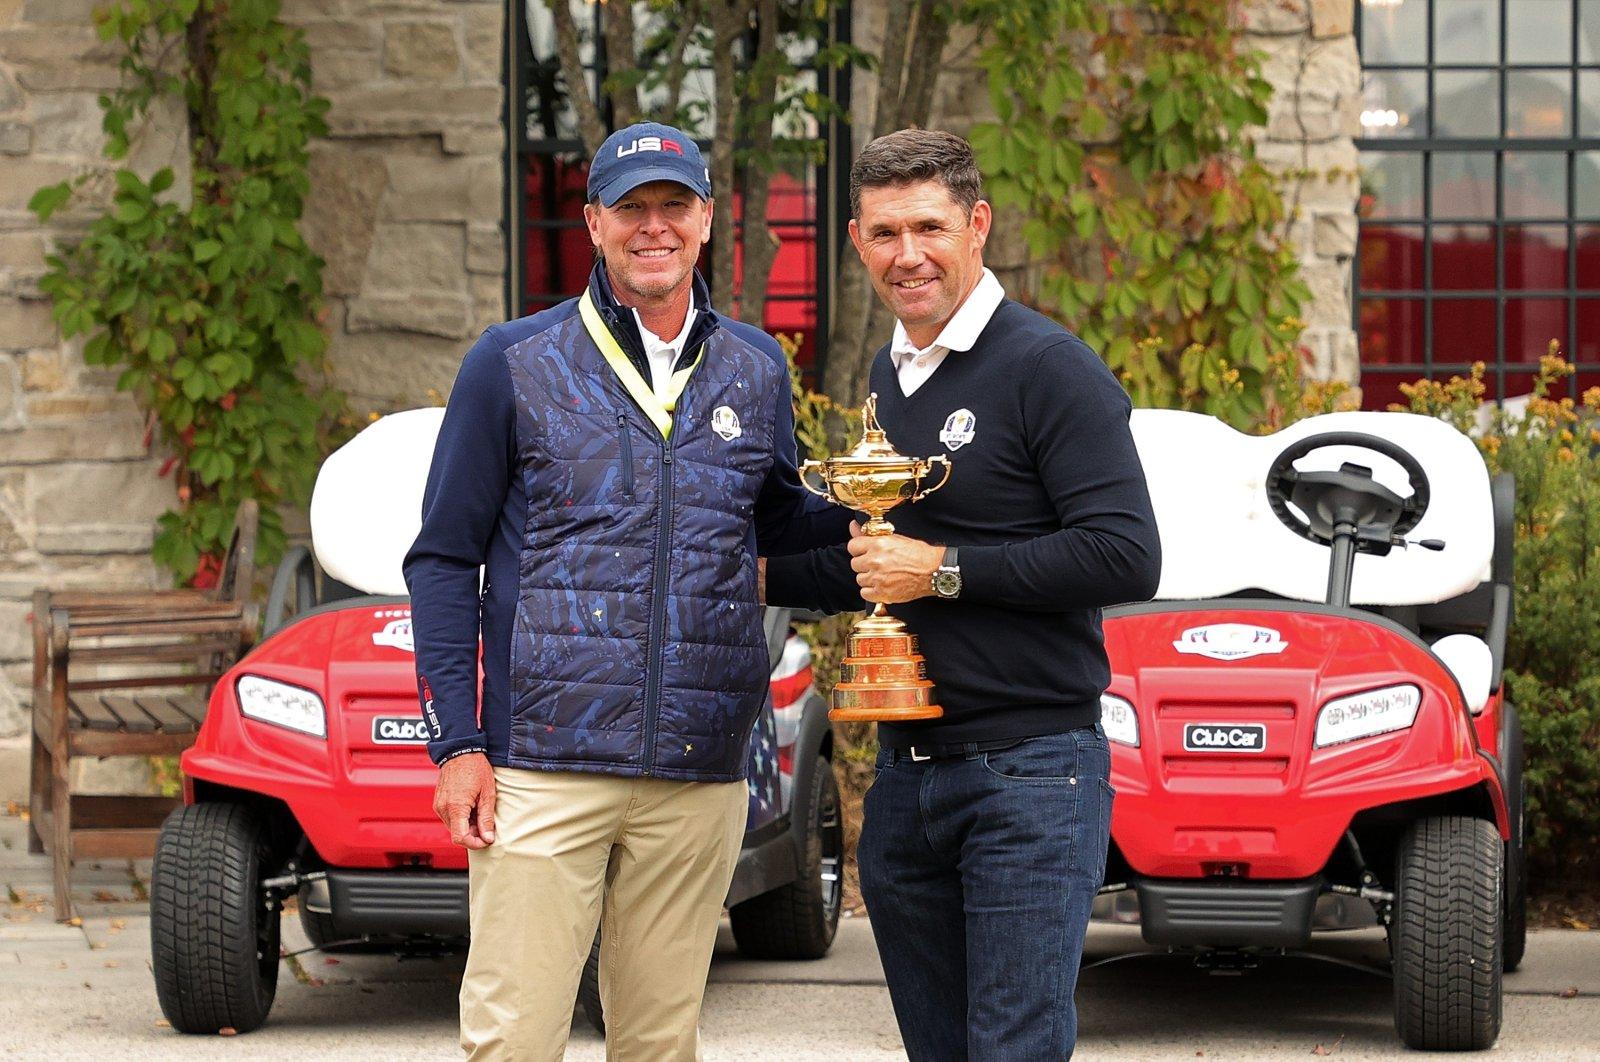 U.S. Ryder Cup captain Steve Stricker (L) greets European Ryder Cup captain Padraig Harrington prior to the start of the Ryder Cup at Whistling Straits, Kohler, Wisconsin, U.S., Sept. 20, 2021. (AFP Photo)